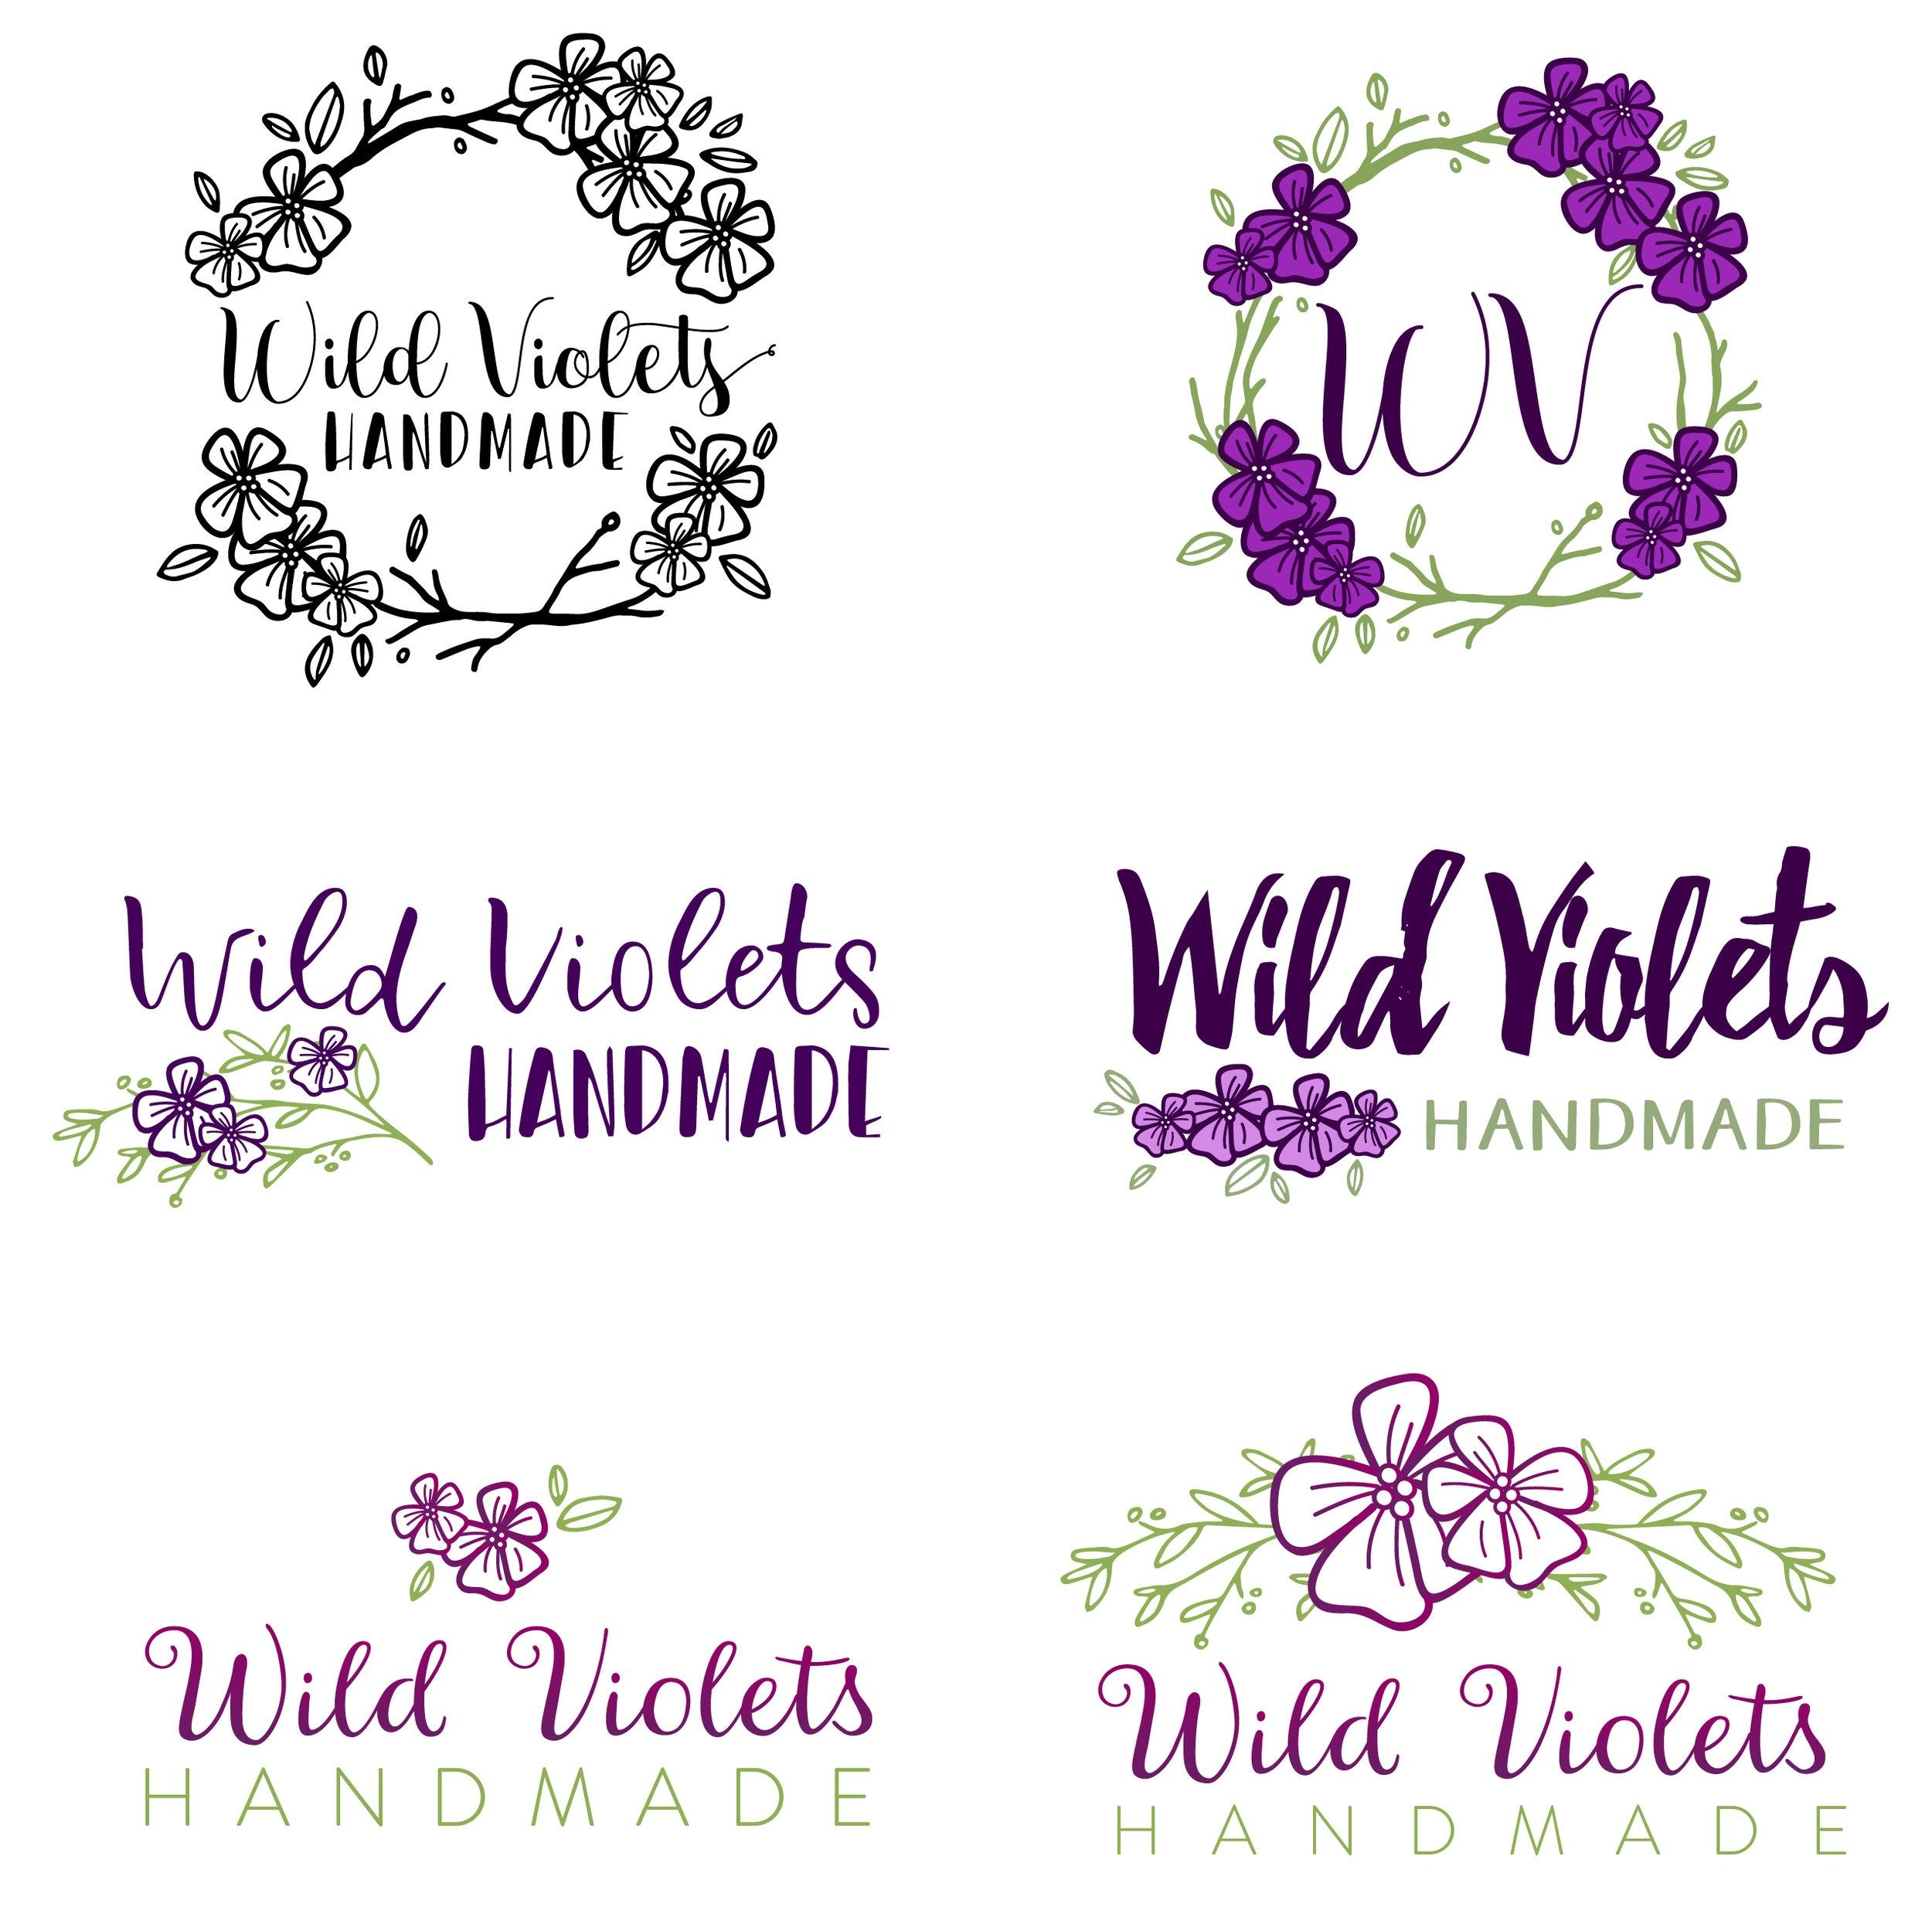 Wild Violets Handmade Proofs BLOG-01.jpg